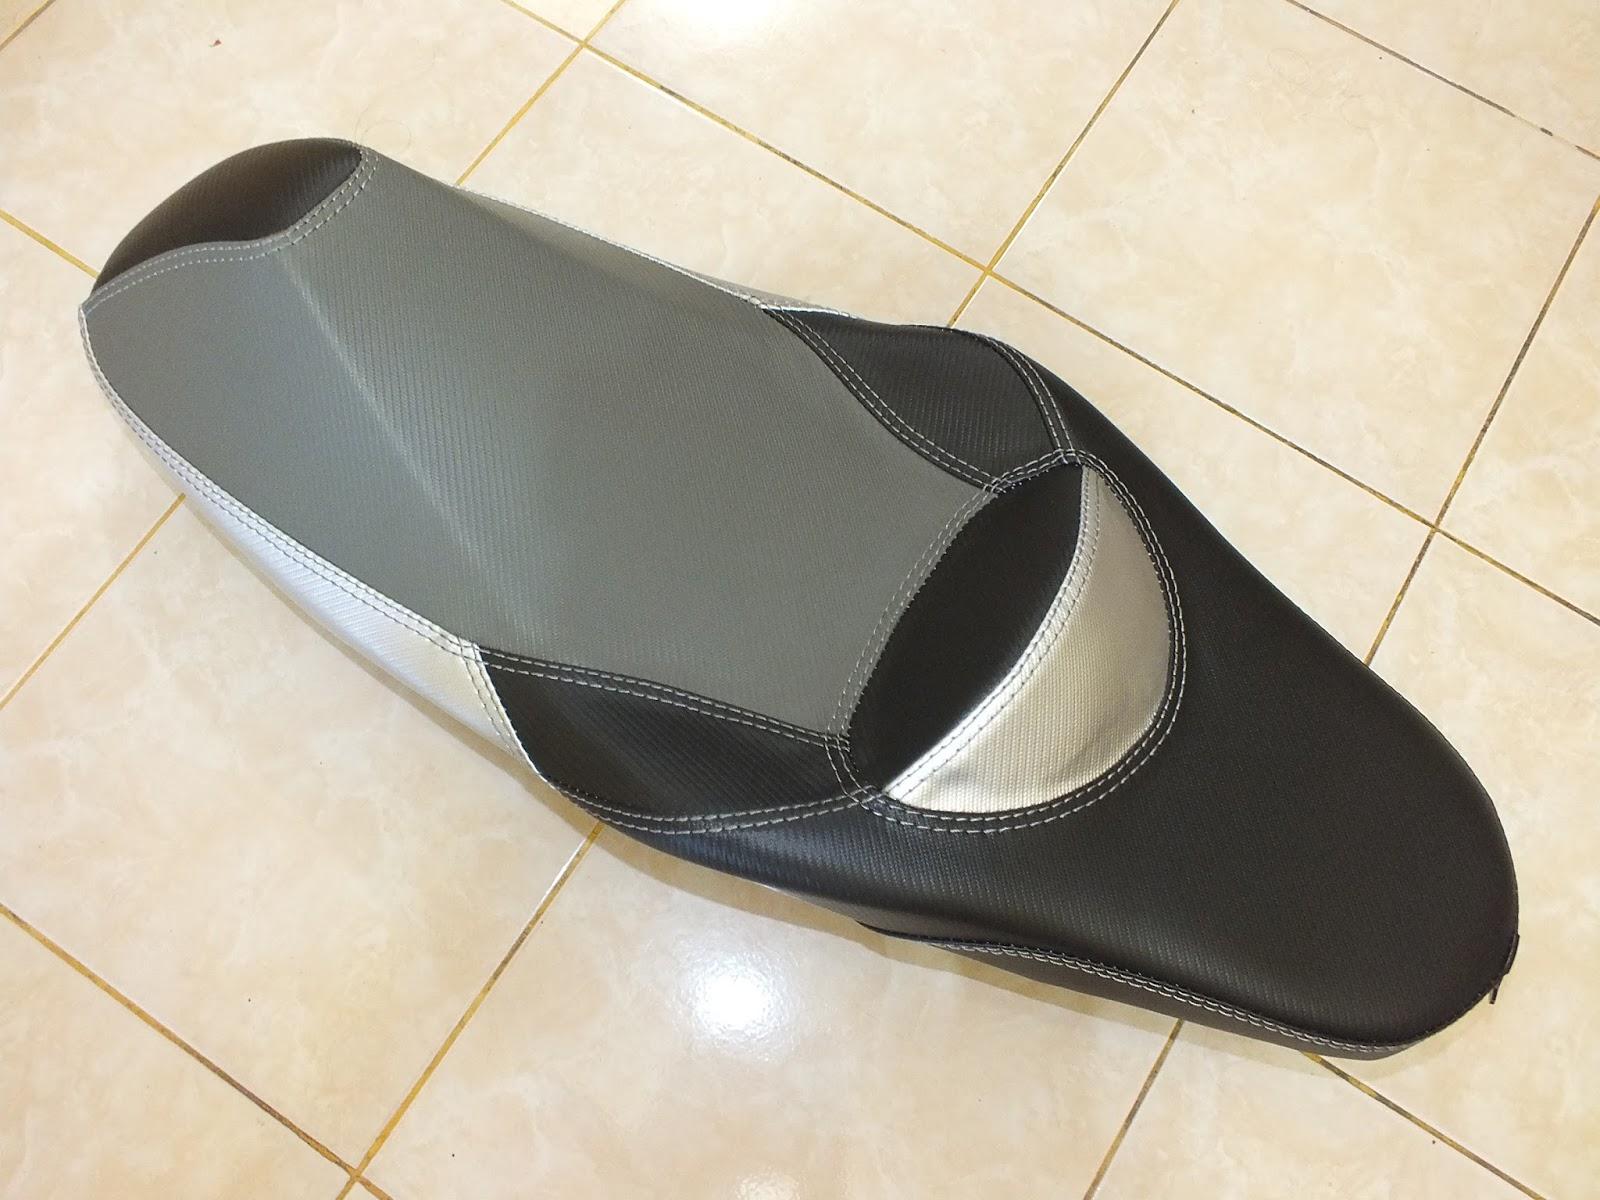 107 Modif Jok Honda Beat Fi Modifikasi Motor Terbaru Karpet Street Pesanan Mr Supri Tangerang